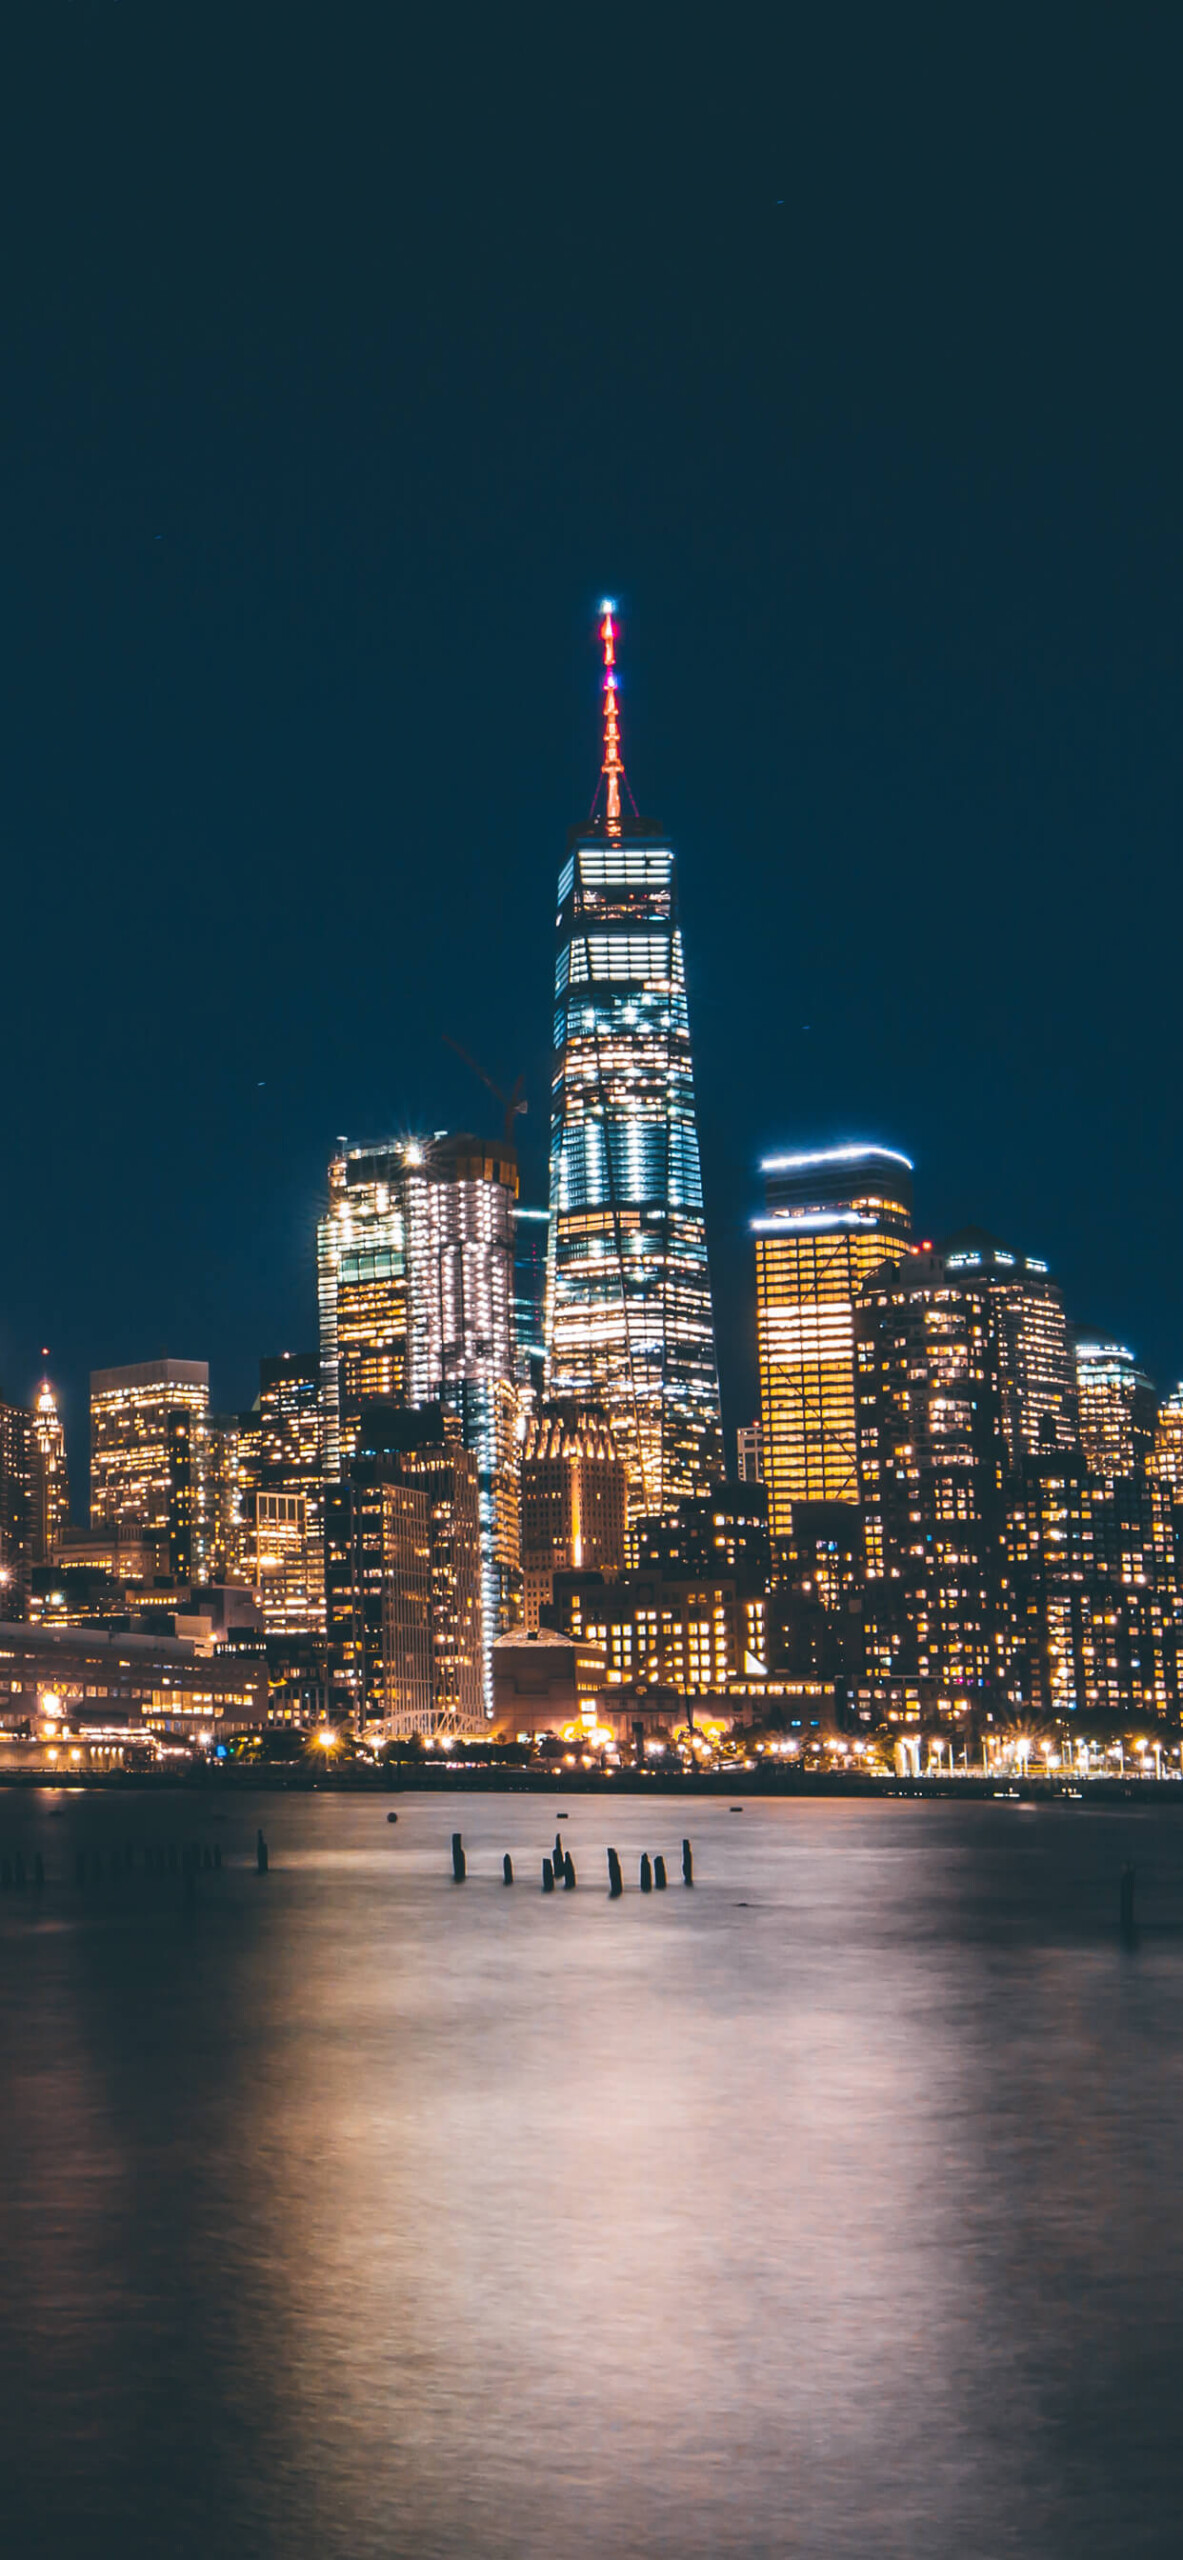 New York City Lights iPhone XS Max Wallpaper